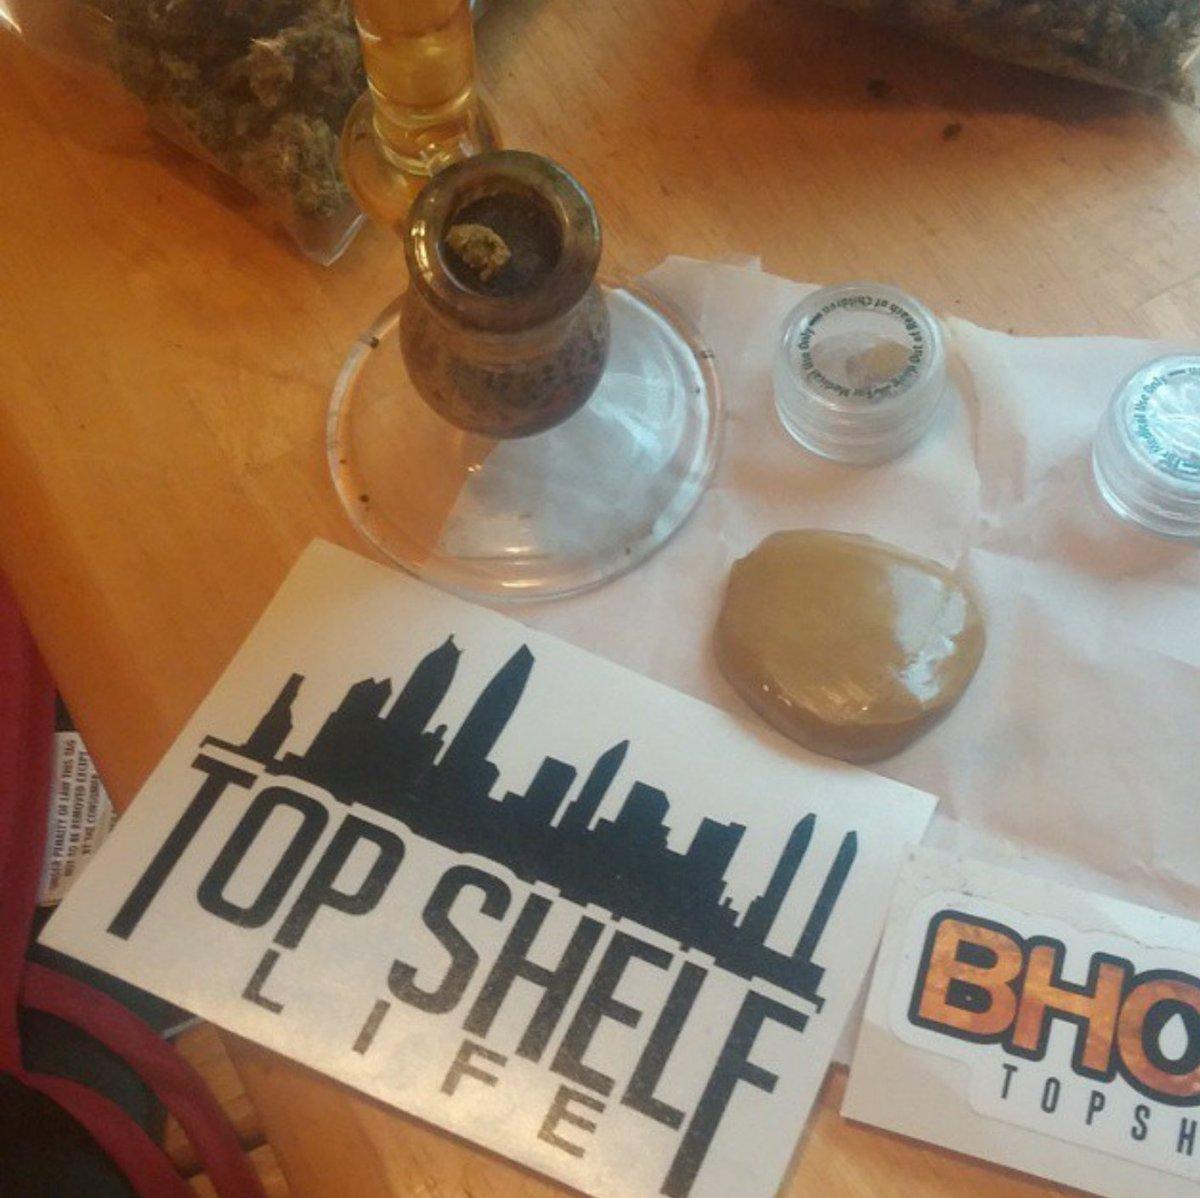 Always smoking on that earwax. #wax #Cannabis #loud #dabs #dabfordiabetes<br>http://pic.twitter.com/AcozVPofR4